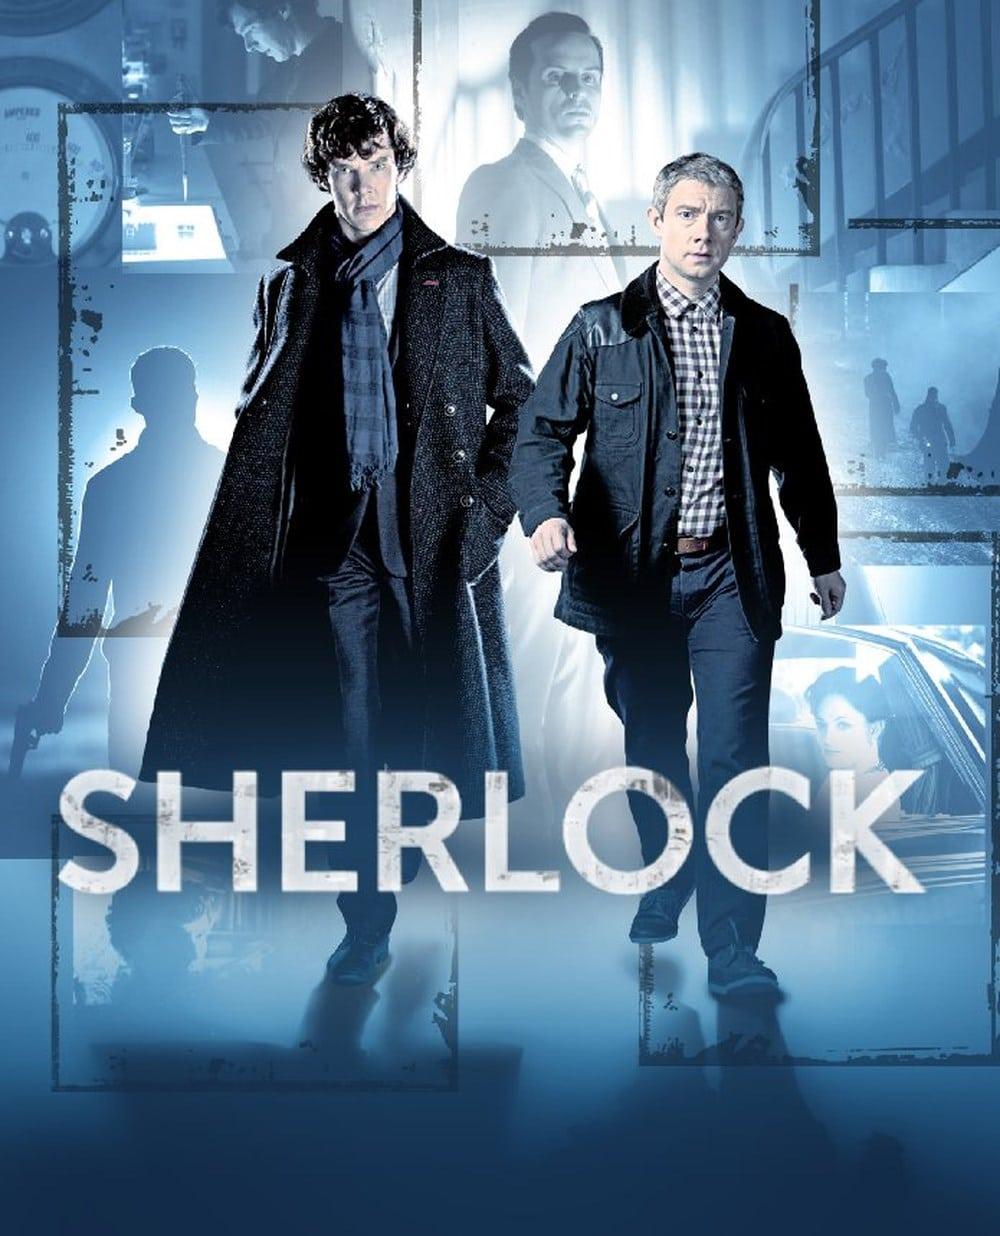 sherlock holmes and Dr.watson poster